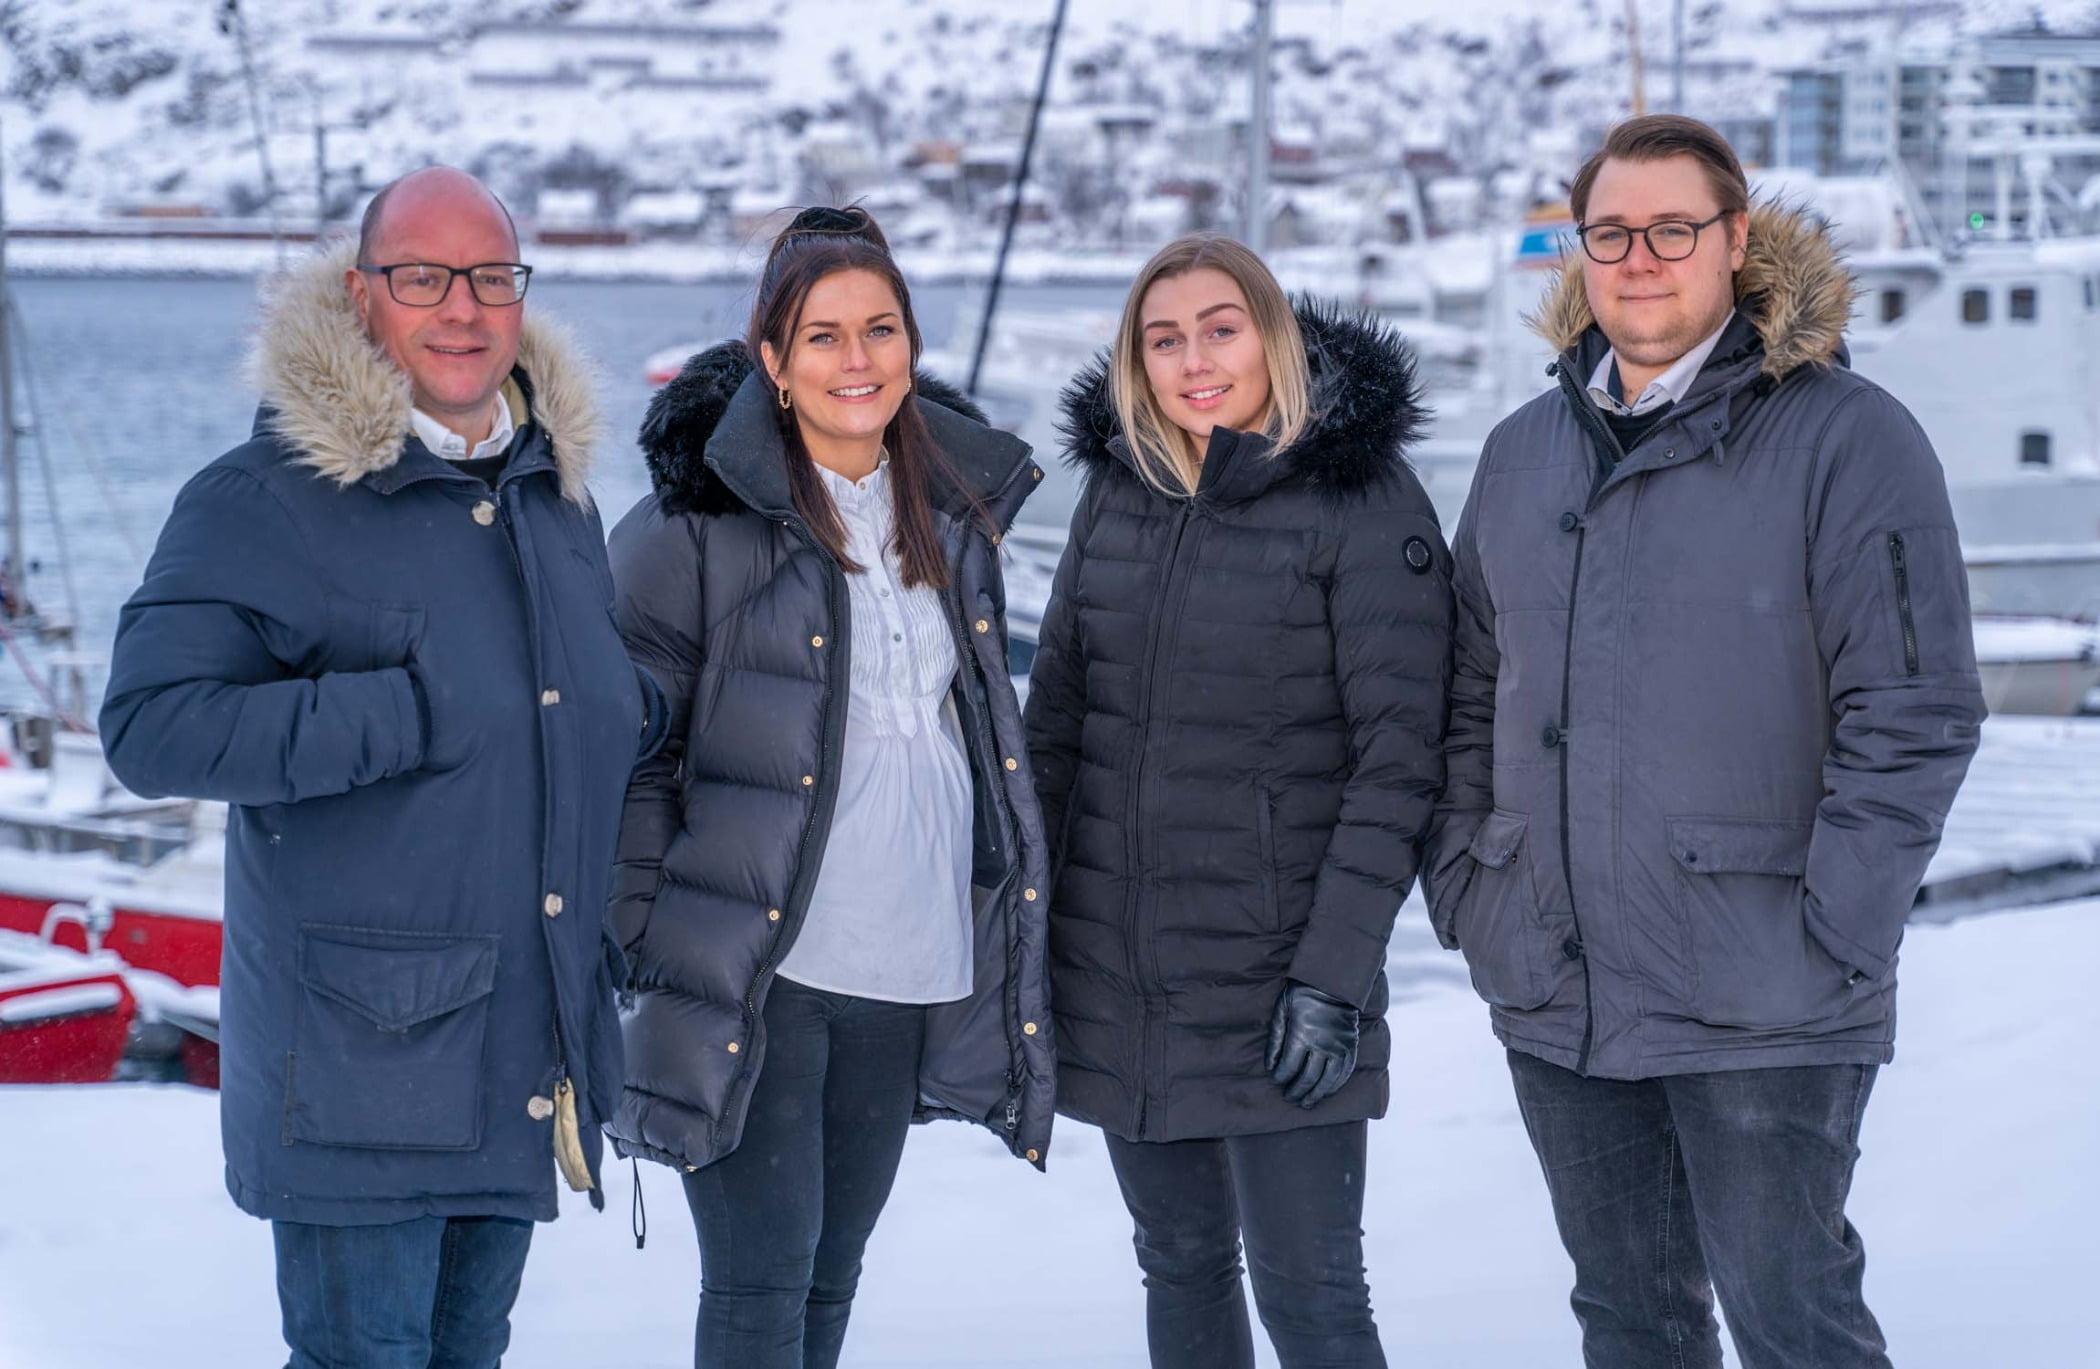 Social group, Smile, Snow, Standing, Fun, Jacket, Freezing